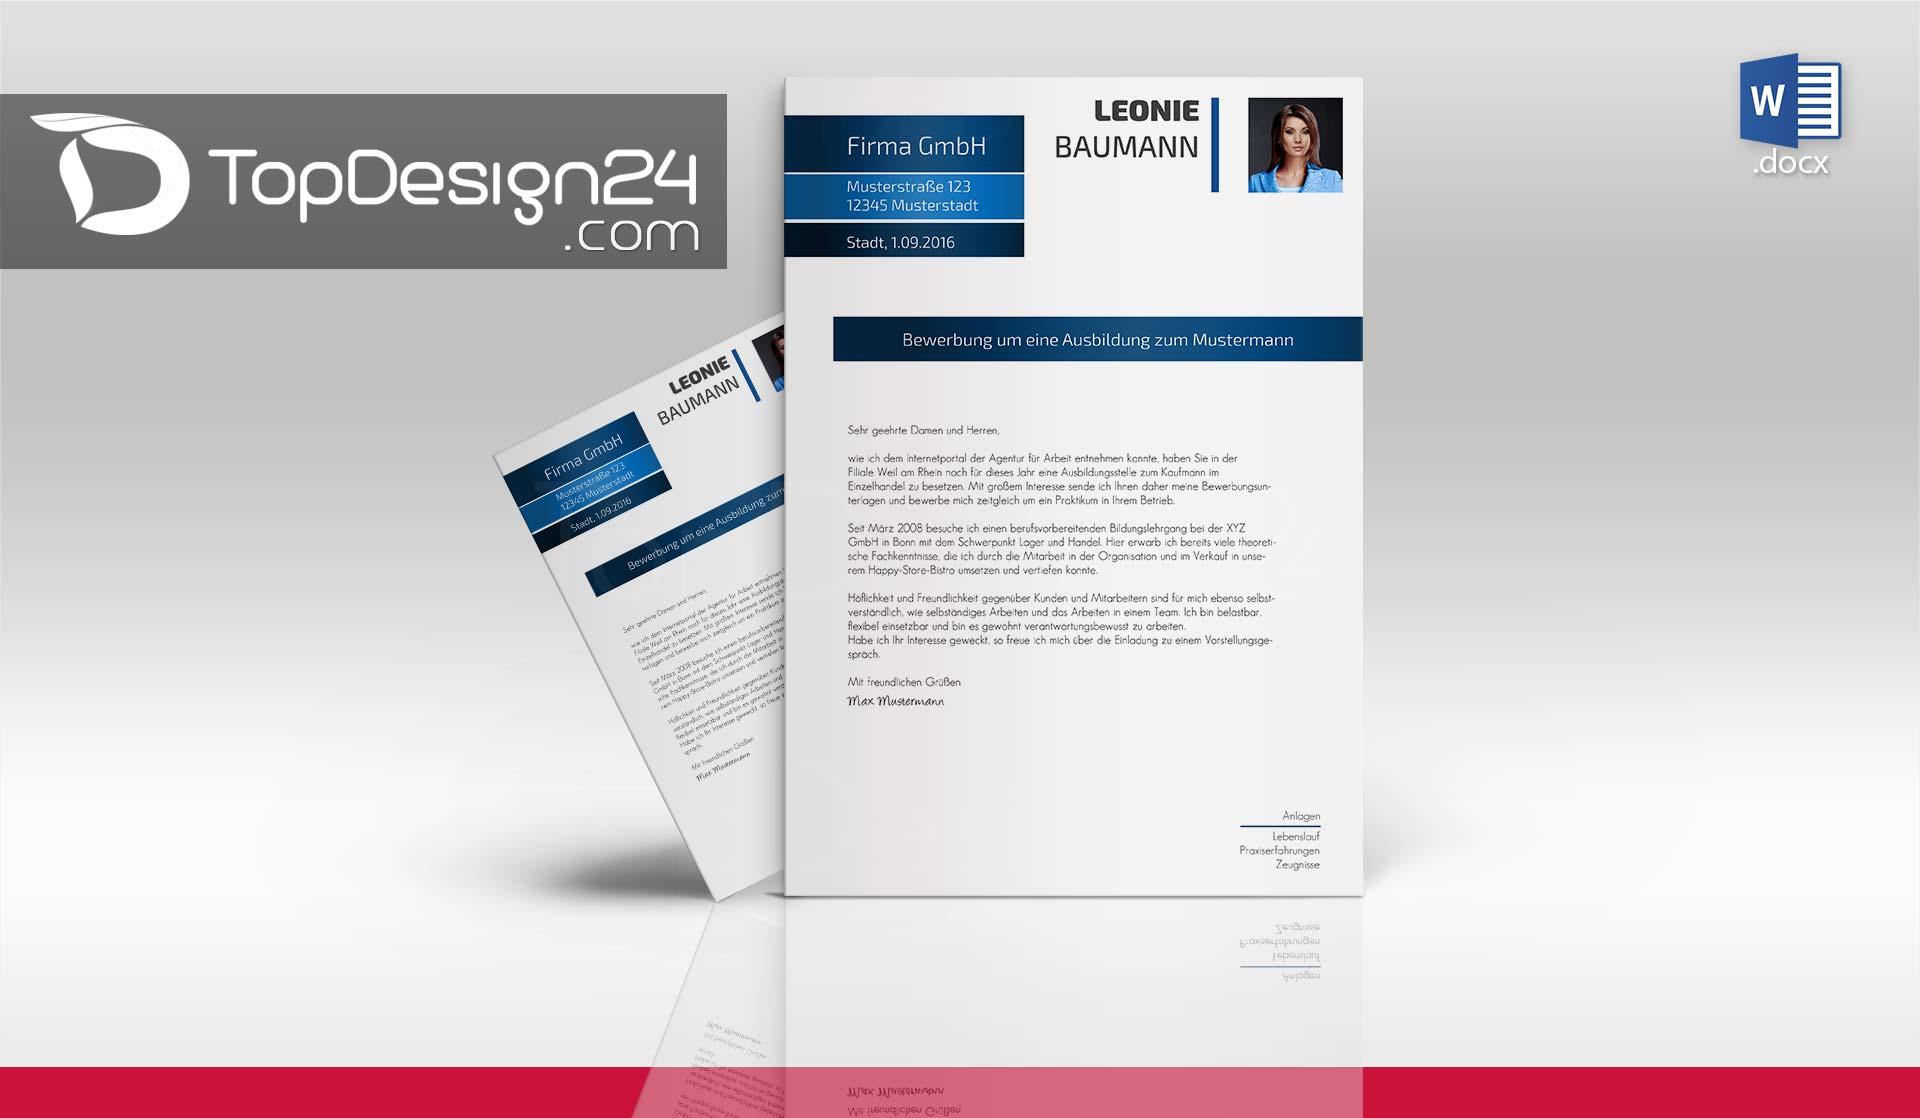 Bewerbung Design Word Topdesign24 Bewerbungsvorlagen: create a blueprint